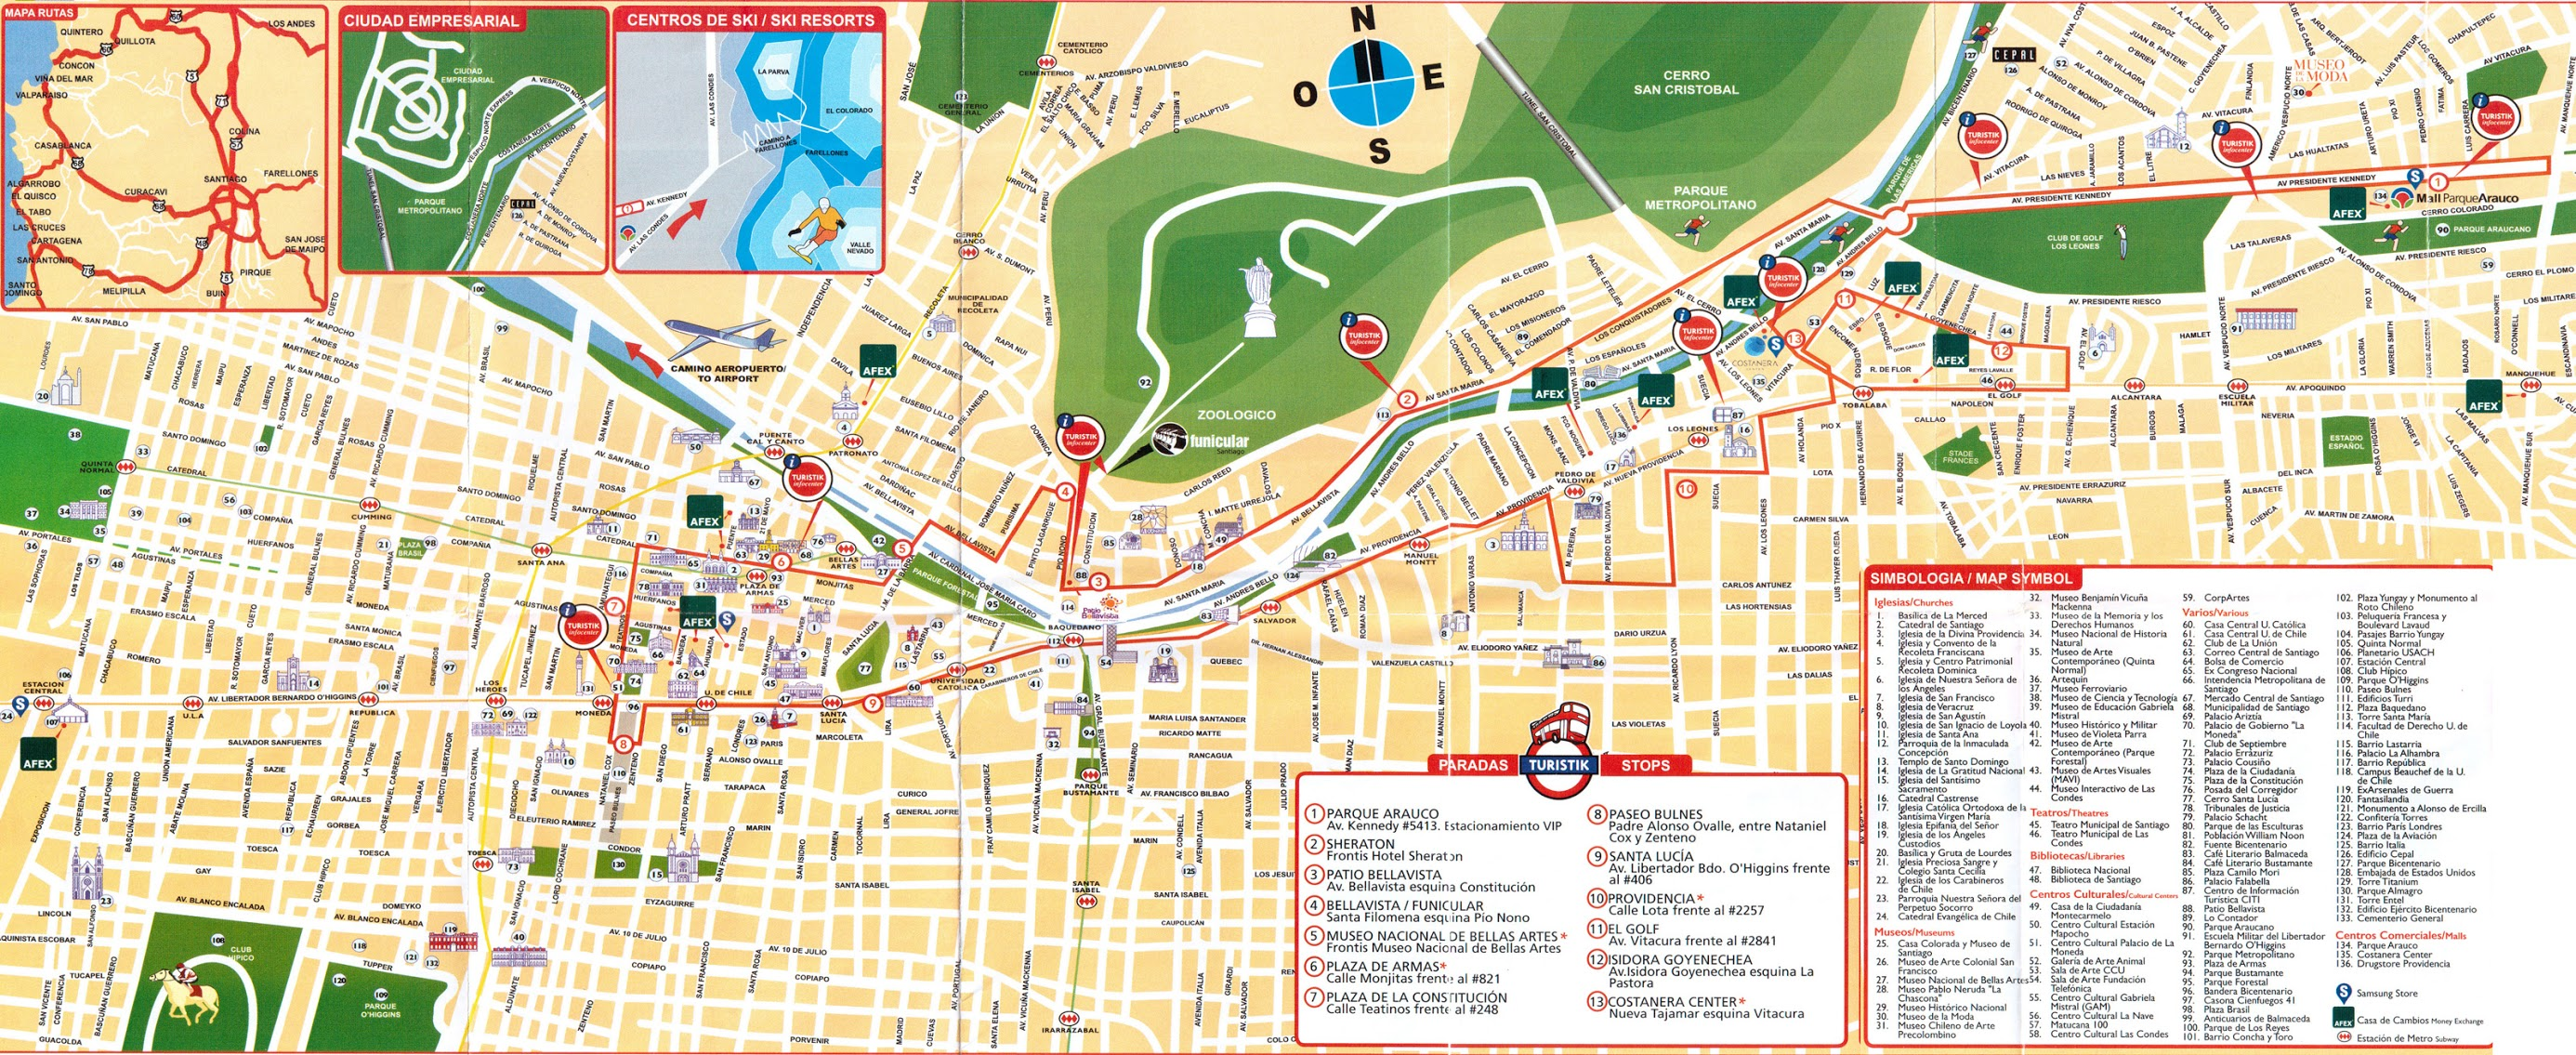 Santiago De Chile Mapa Turistico.Mapa De Santiago De Chile Para Imprimir Minimalist